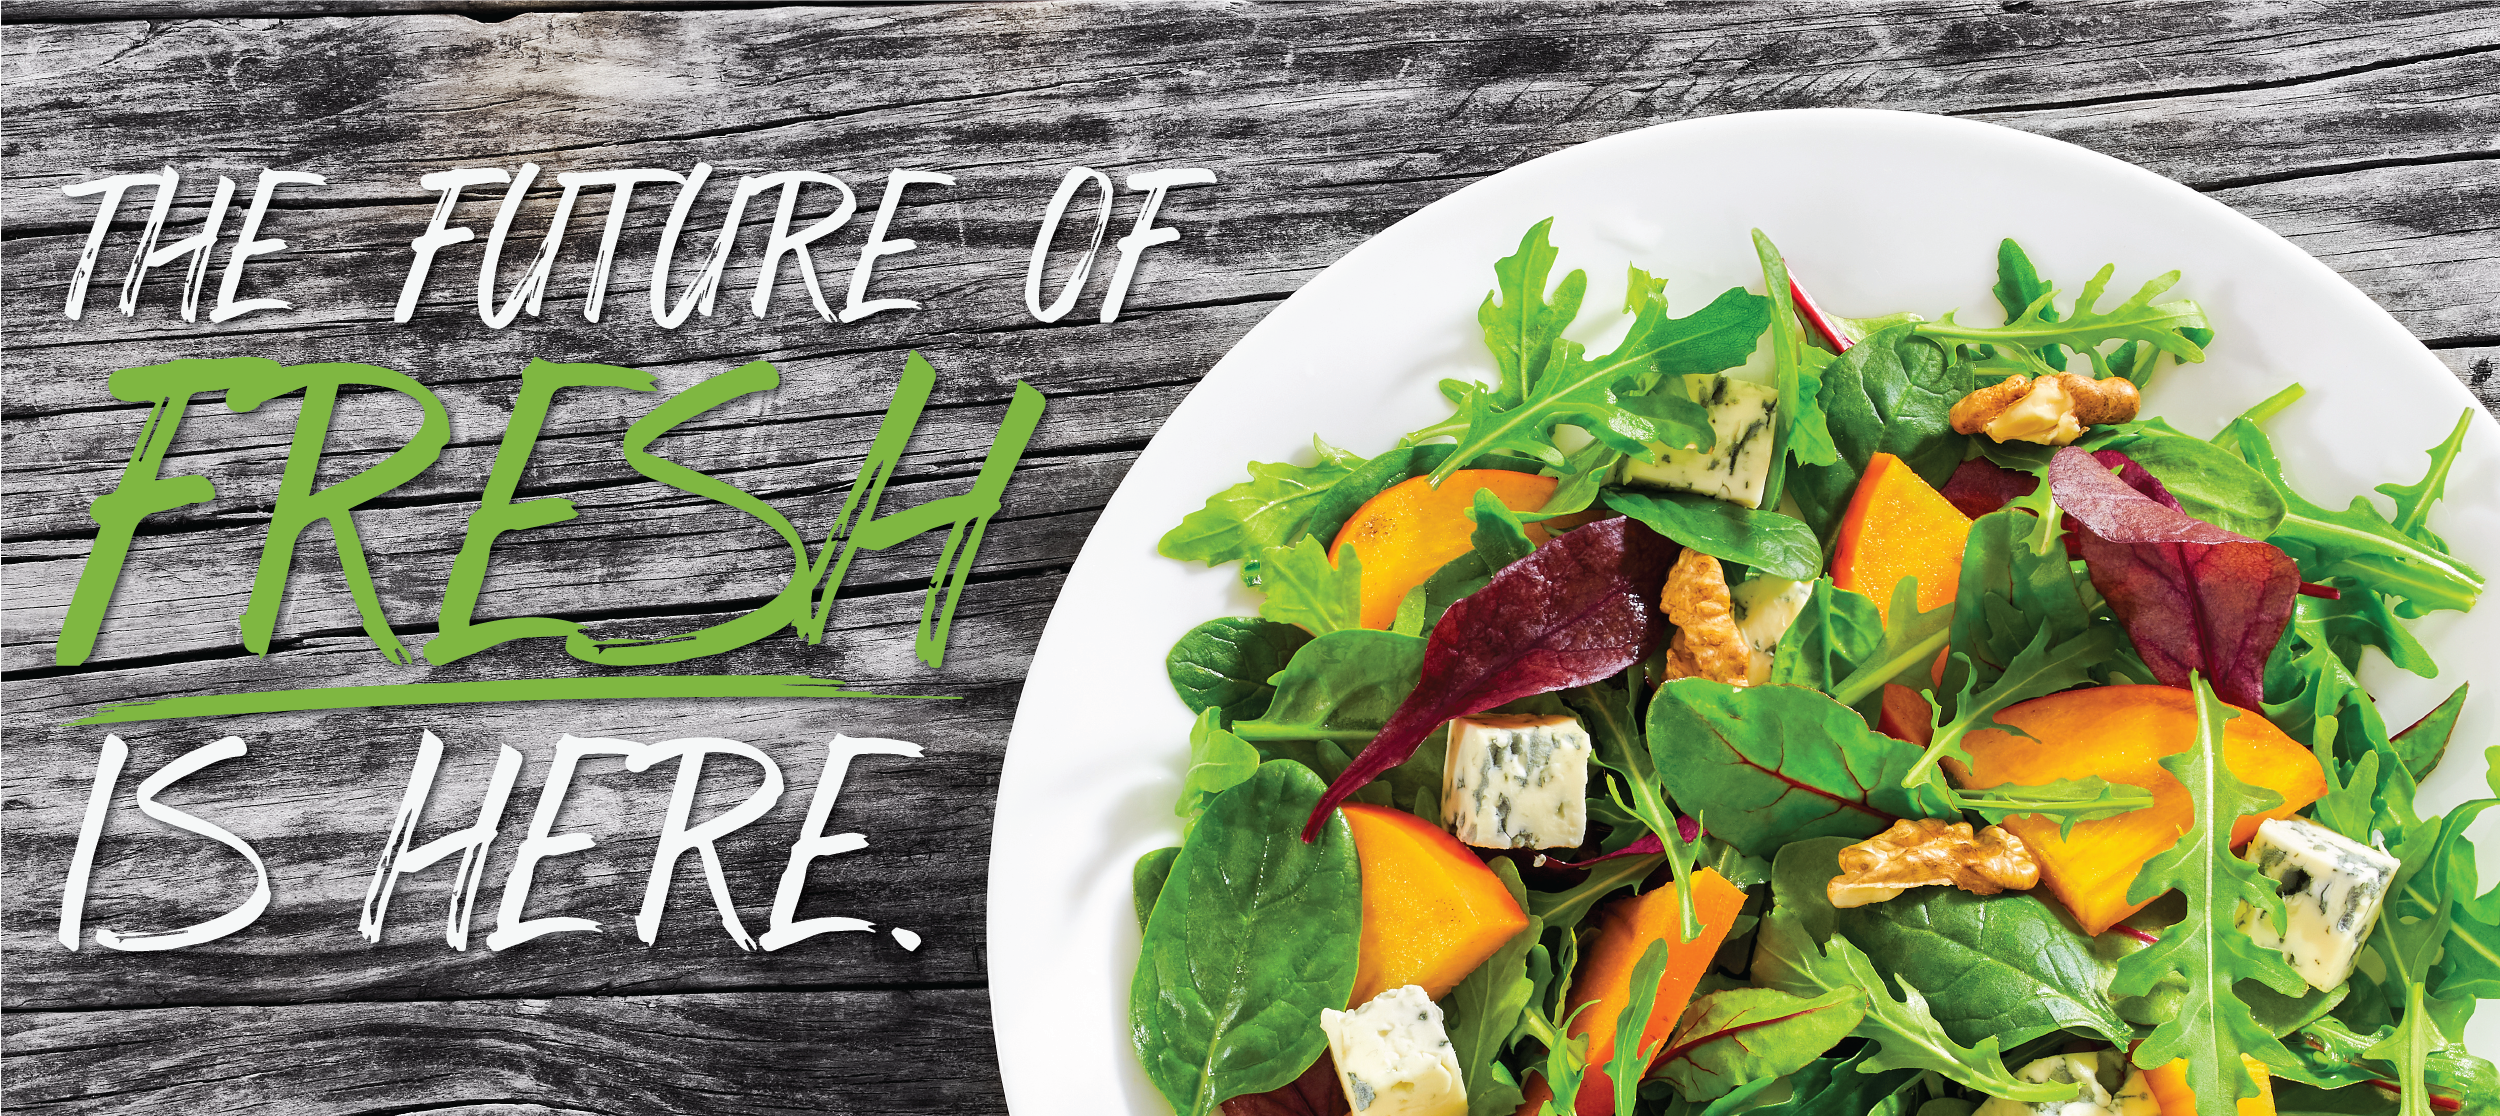 Salad-text